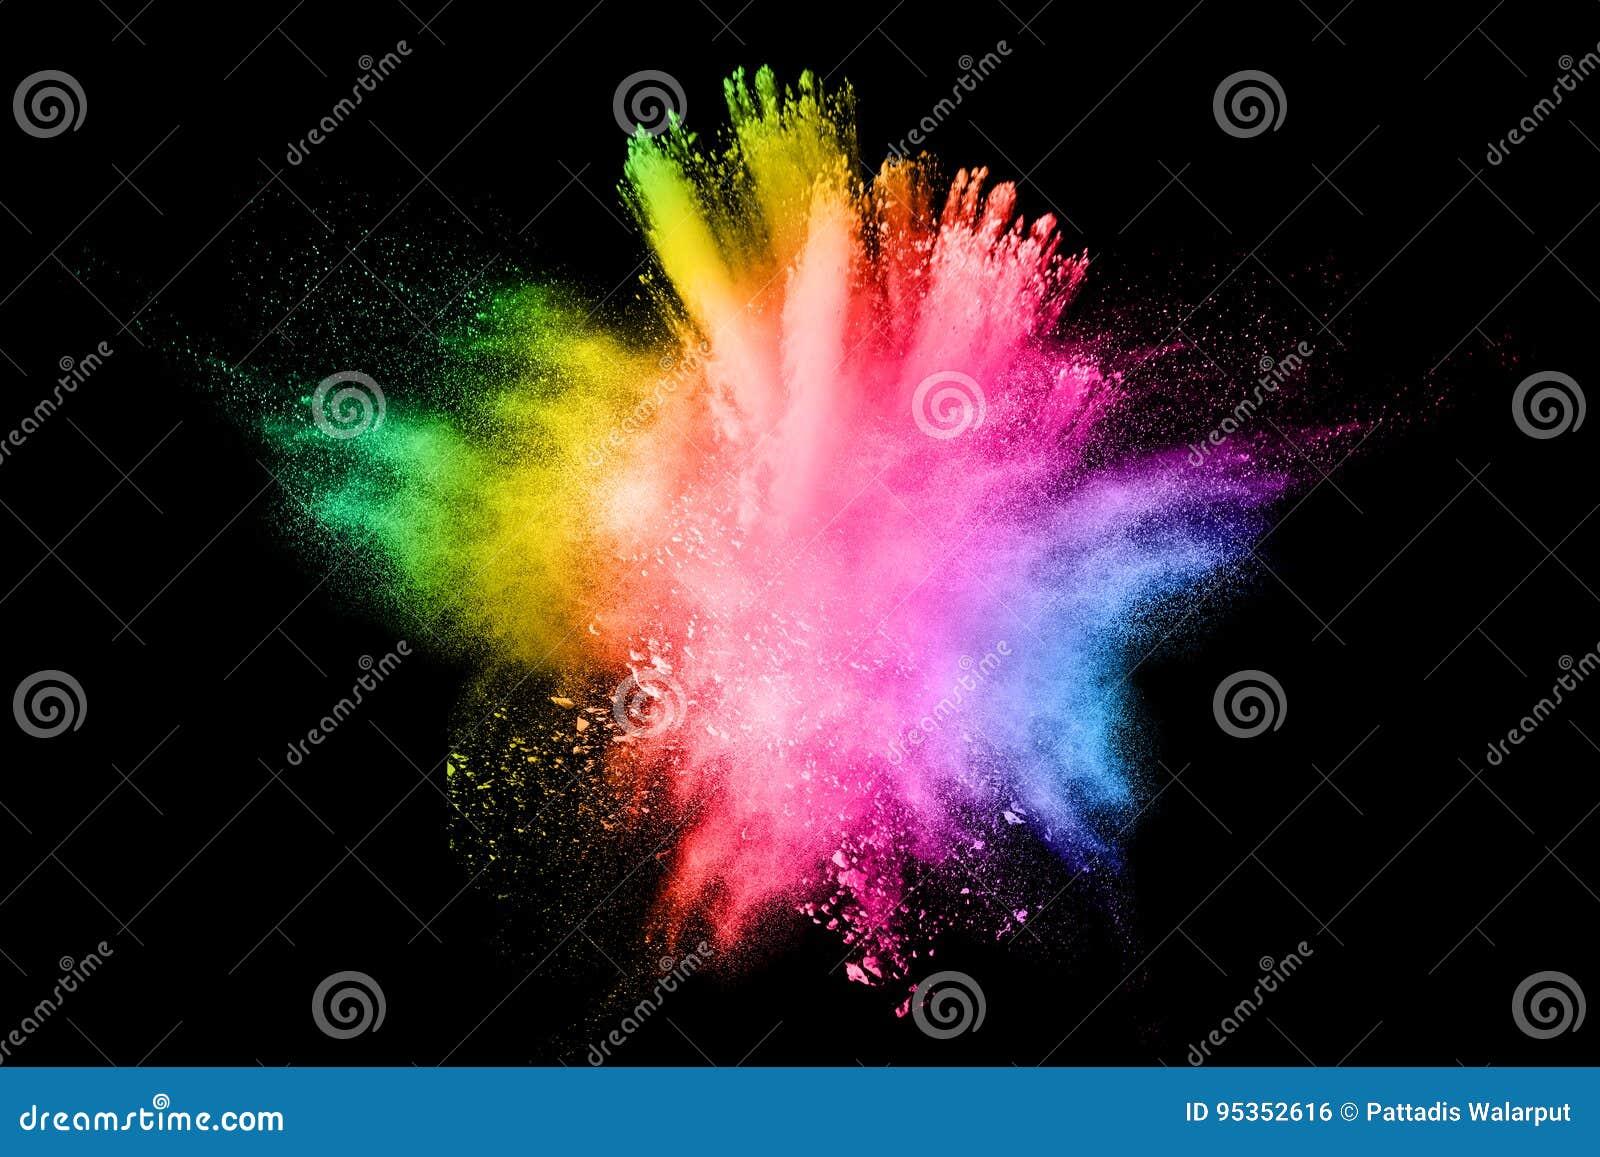 Farbige Pulverexplosion